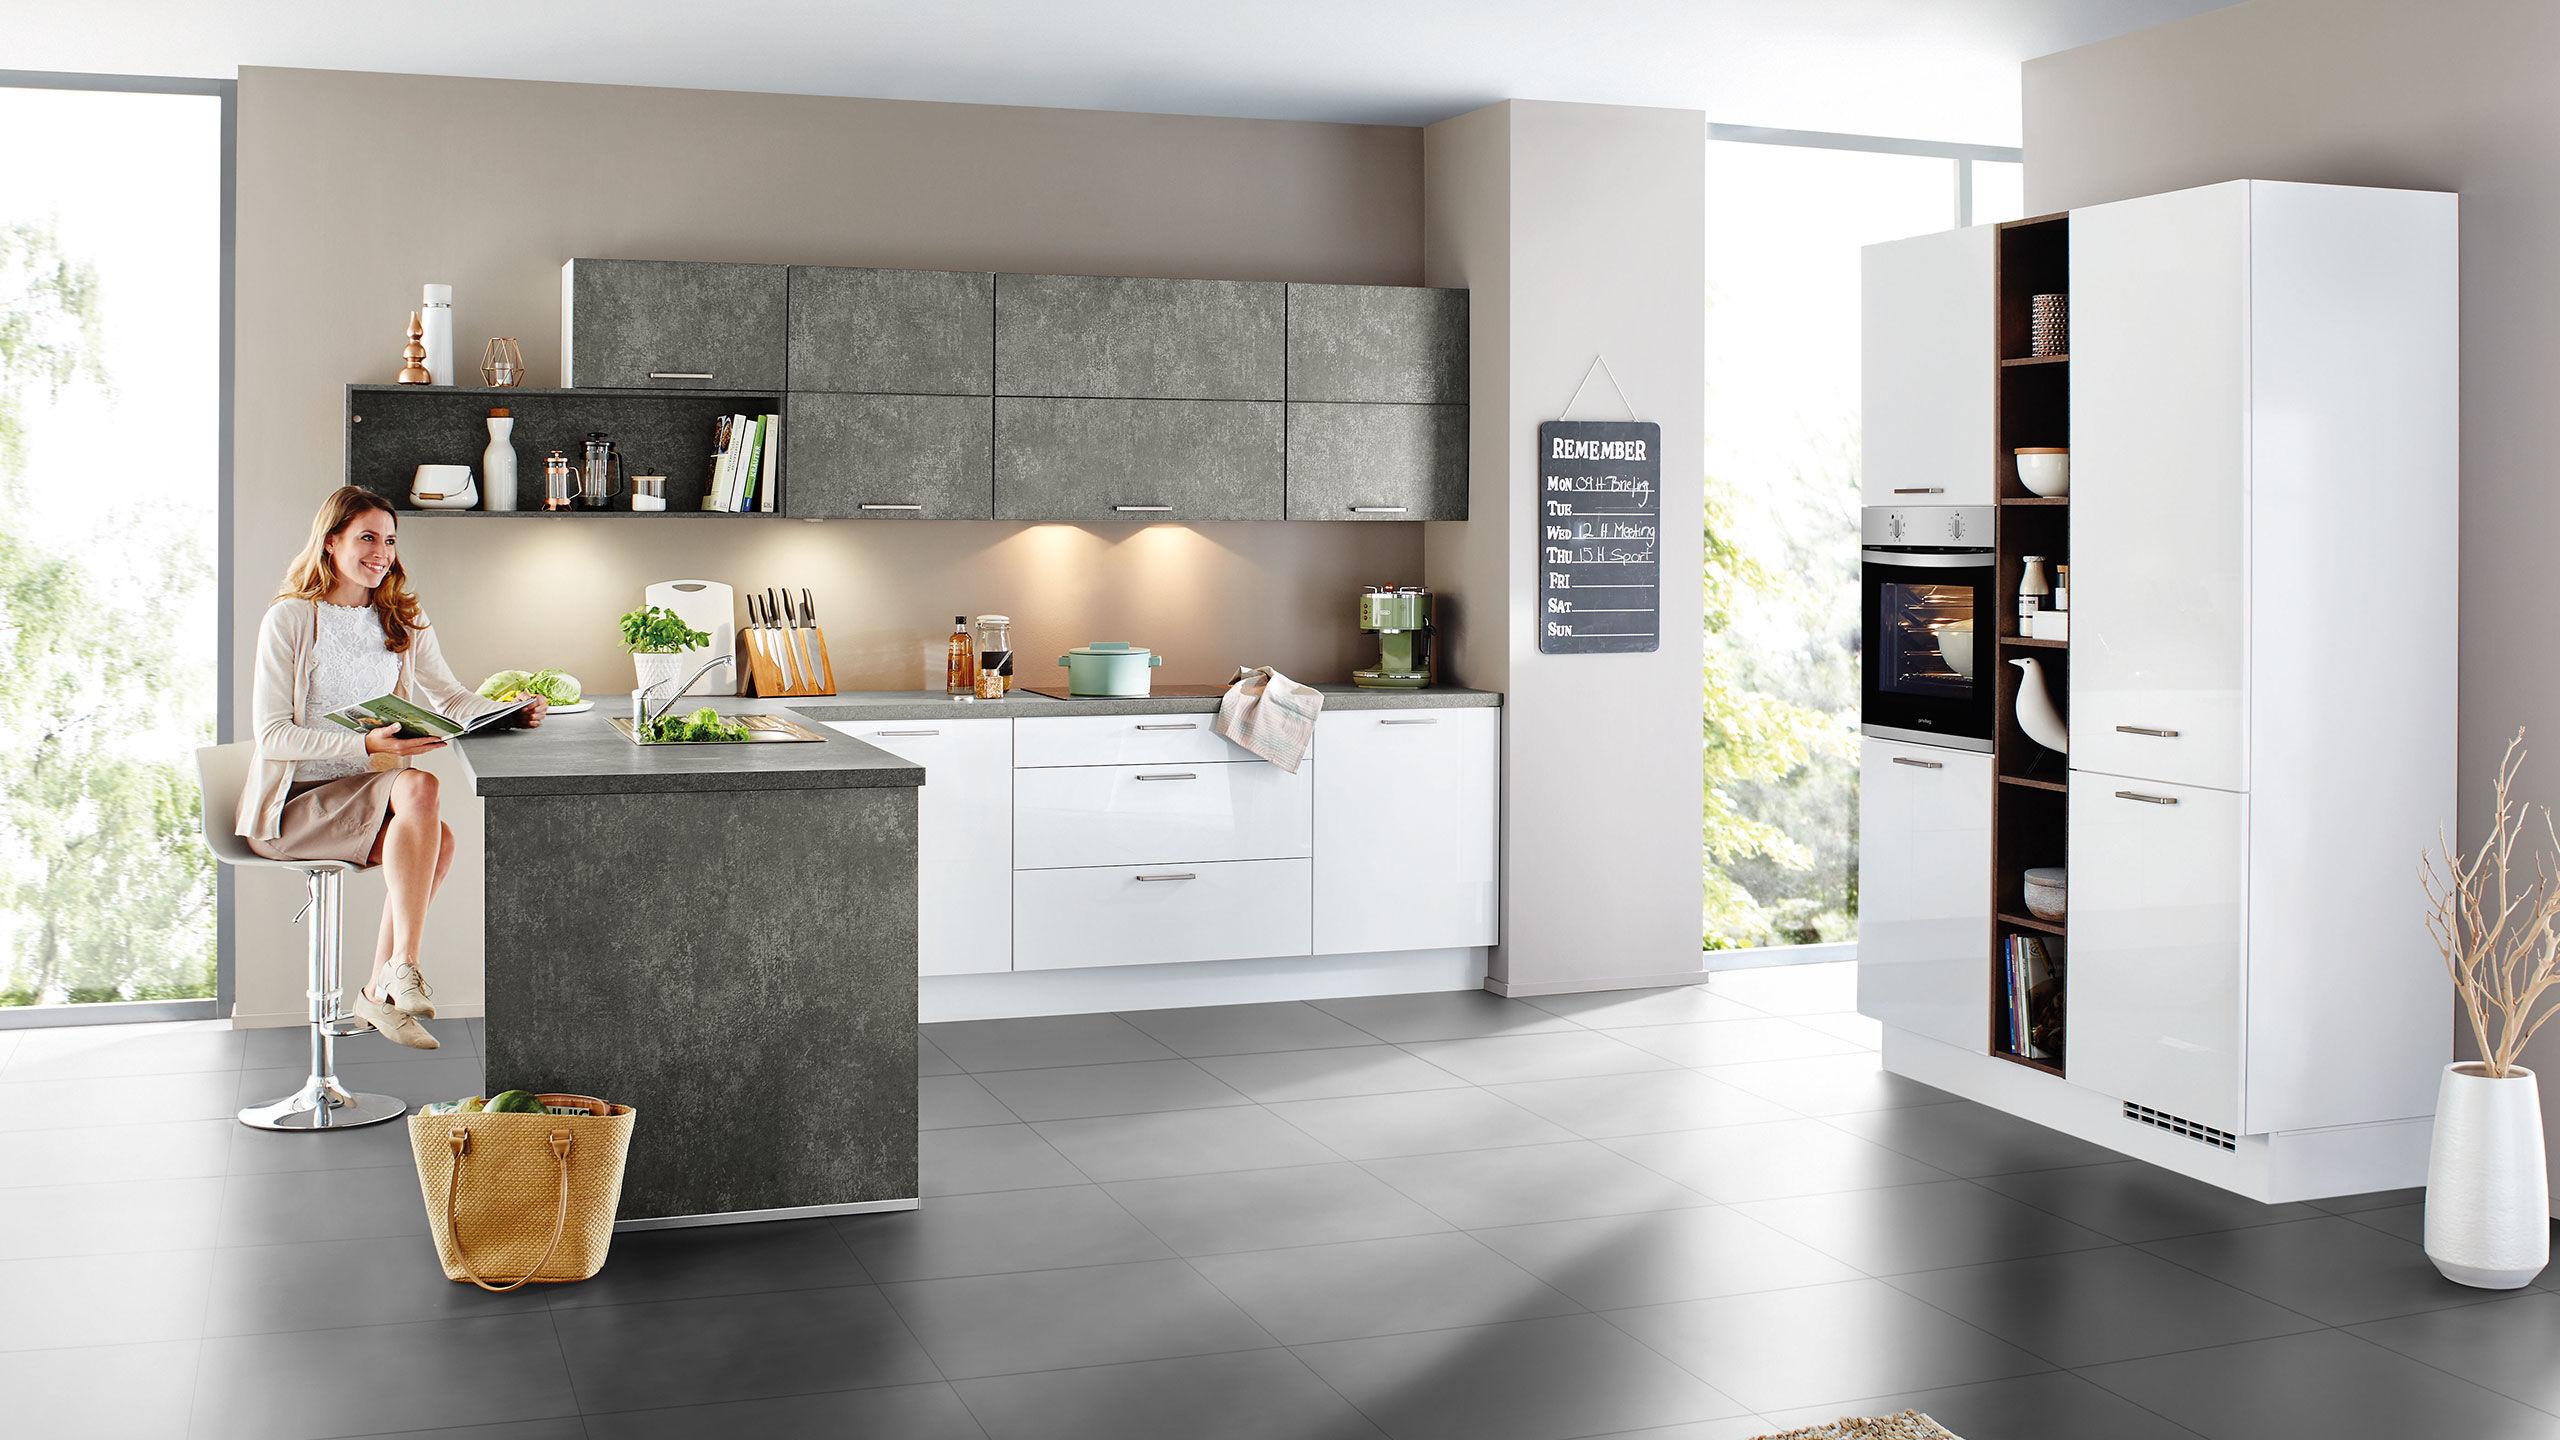 Full Size of Küche Grau Hochglanz Ikea Küche Weiß Hochglanz Arbeitsplatte Grau Küche Weiß Grau Hochglanz Küche In Grau Hochglanz Küche Küche Grau Hochglanz